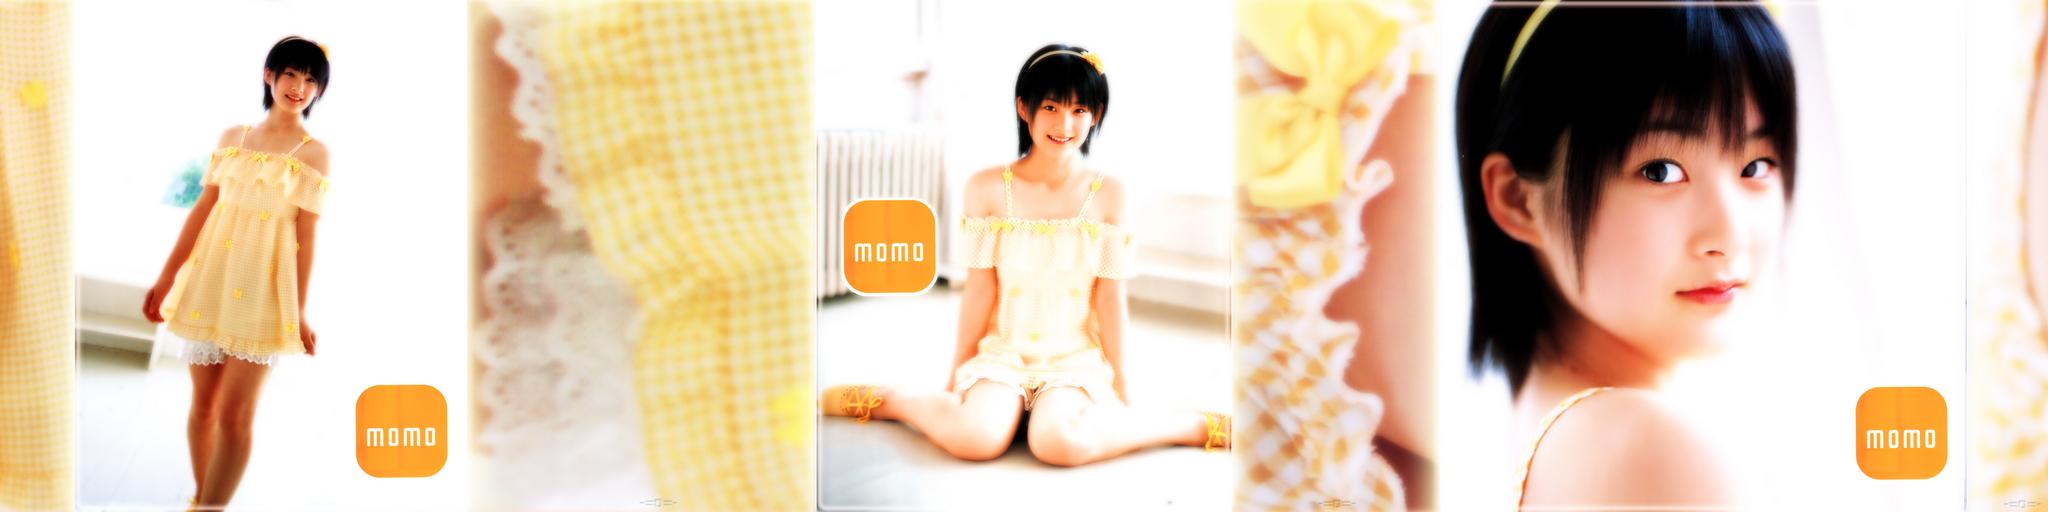 Momo-Yellow.jpg